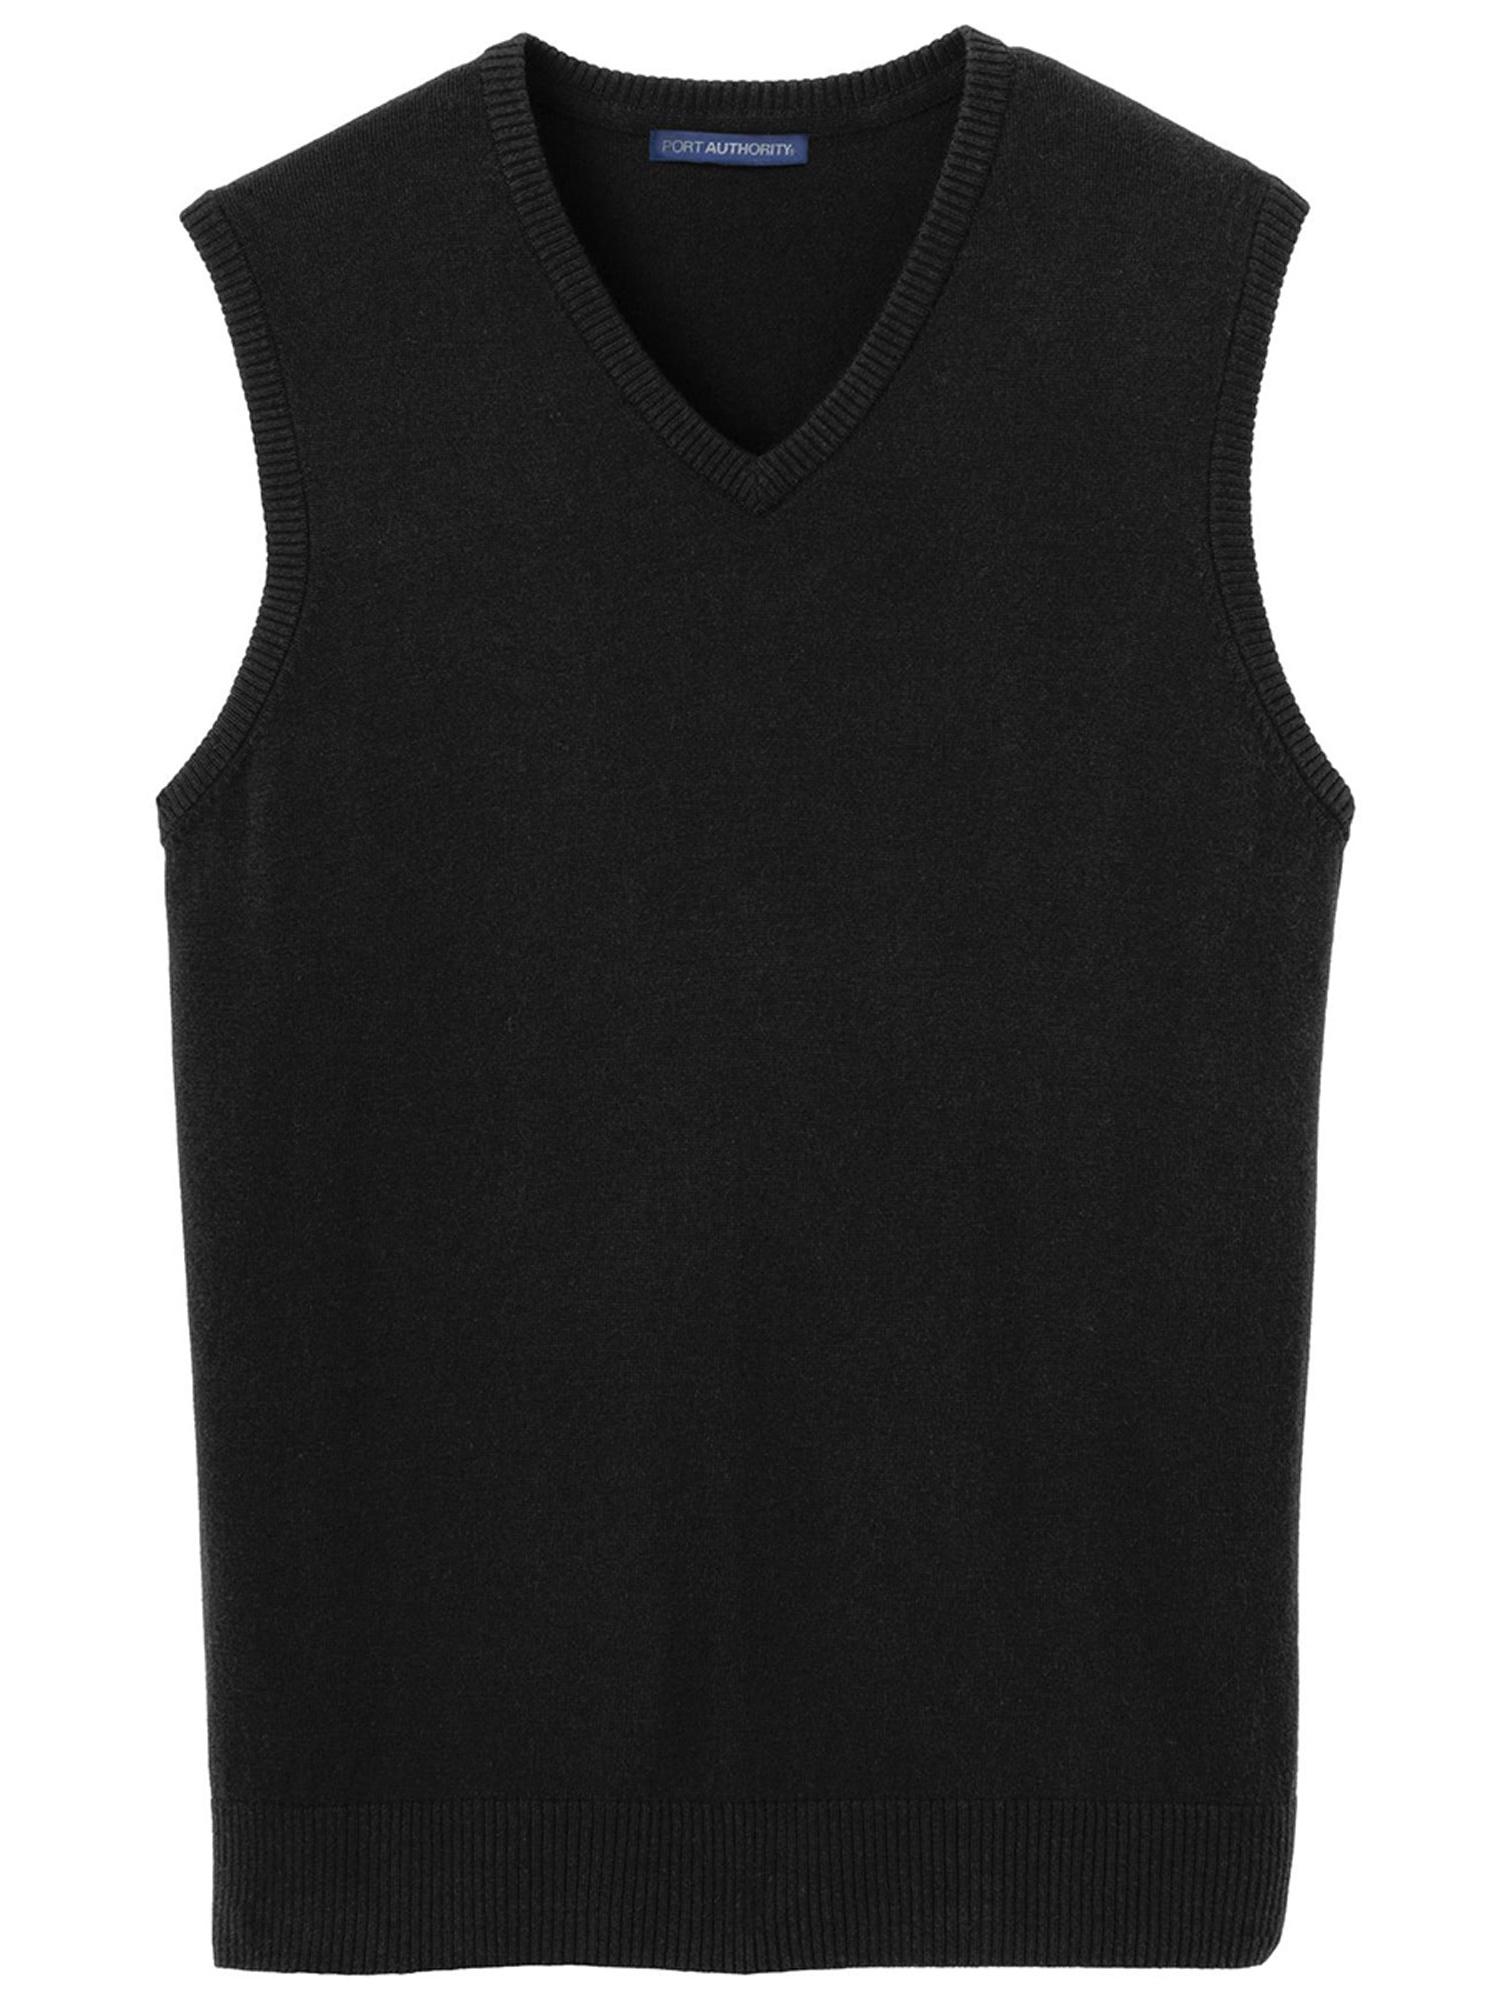 Port Authority Men's Casual Rib Knit V-Neck Sweater Vest